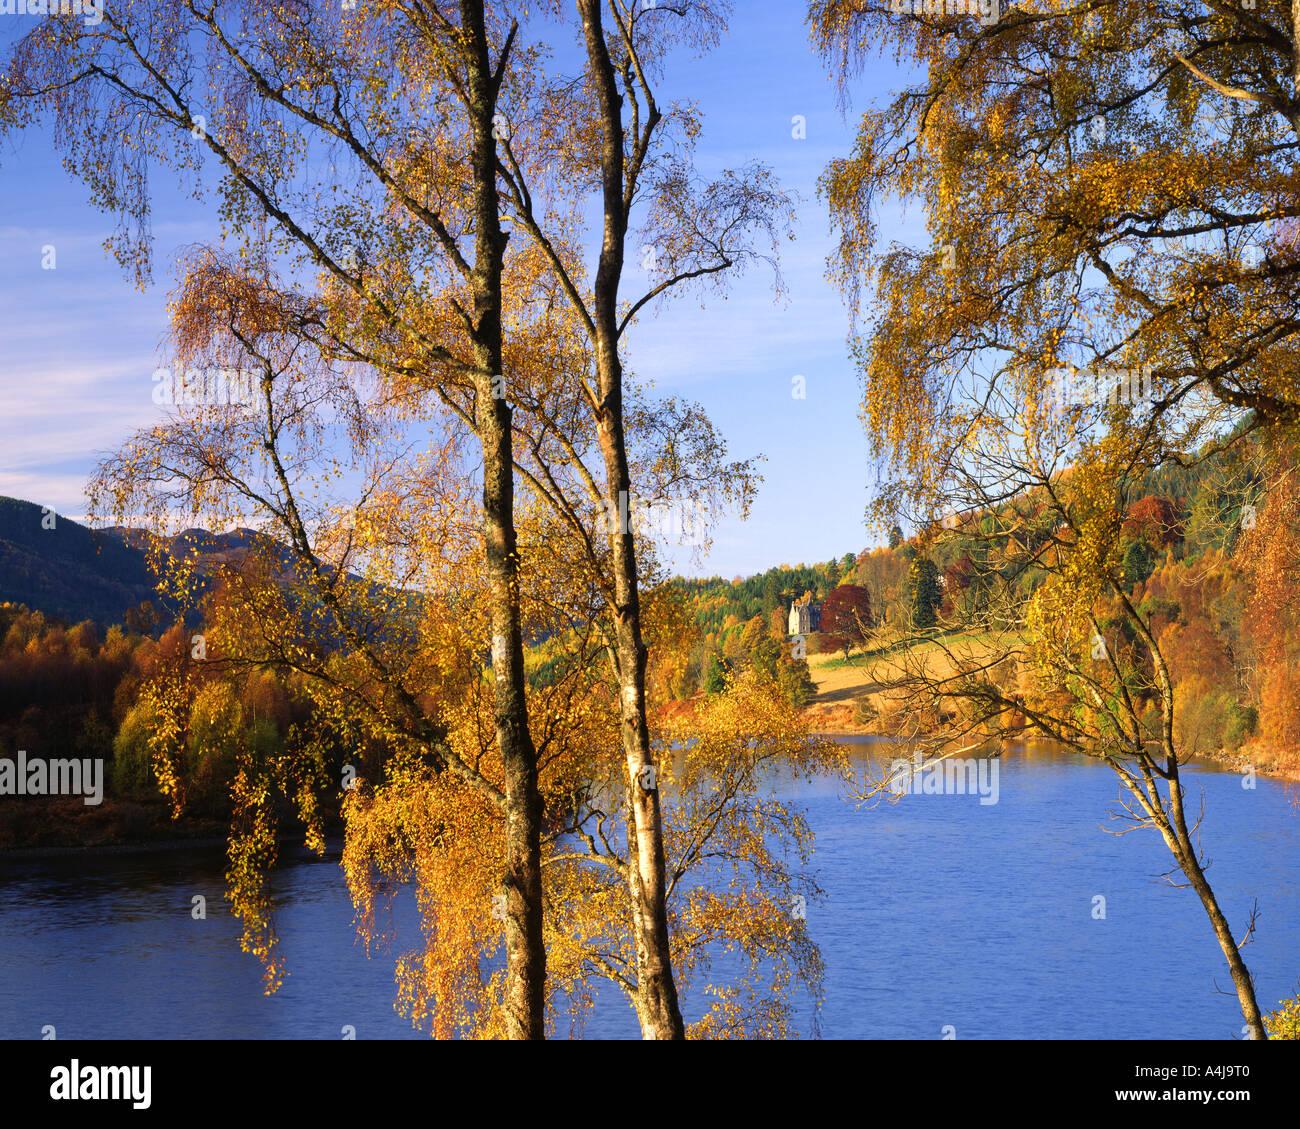 GB - Schottland: Herbst am Loch Tummel Stockbild